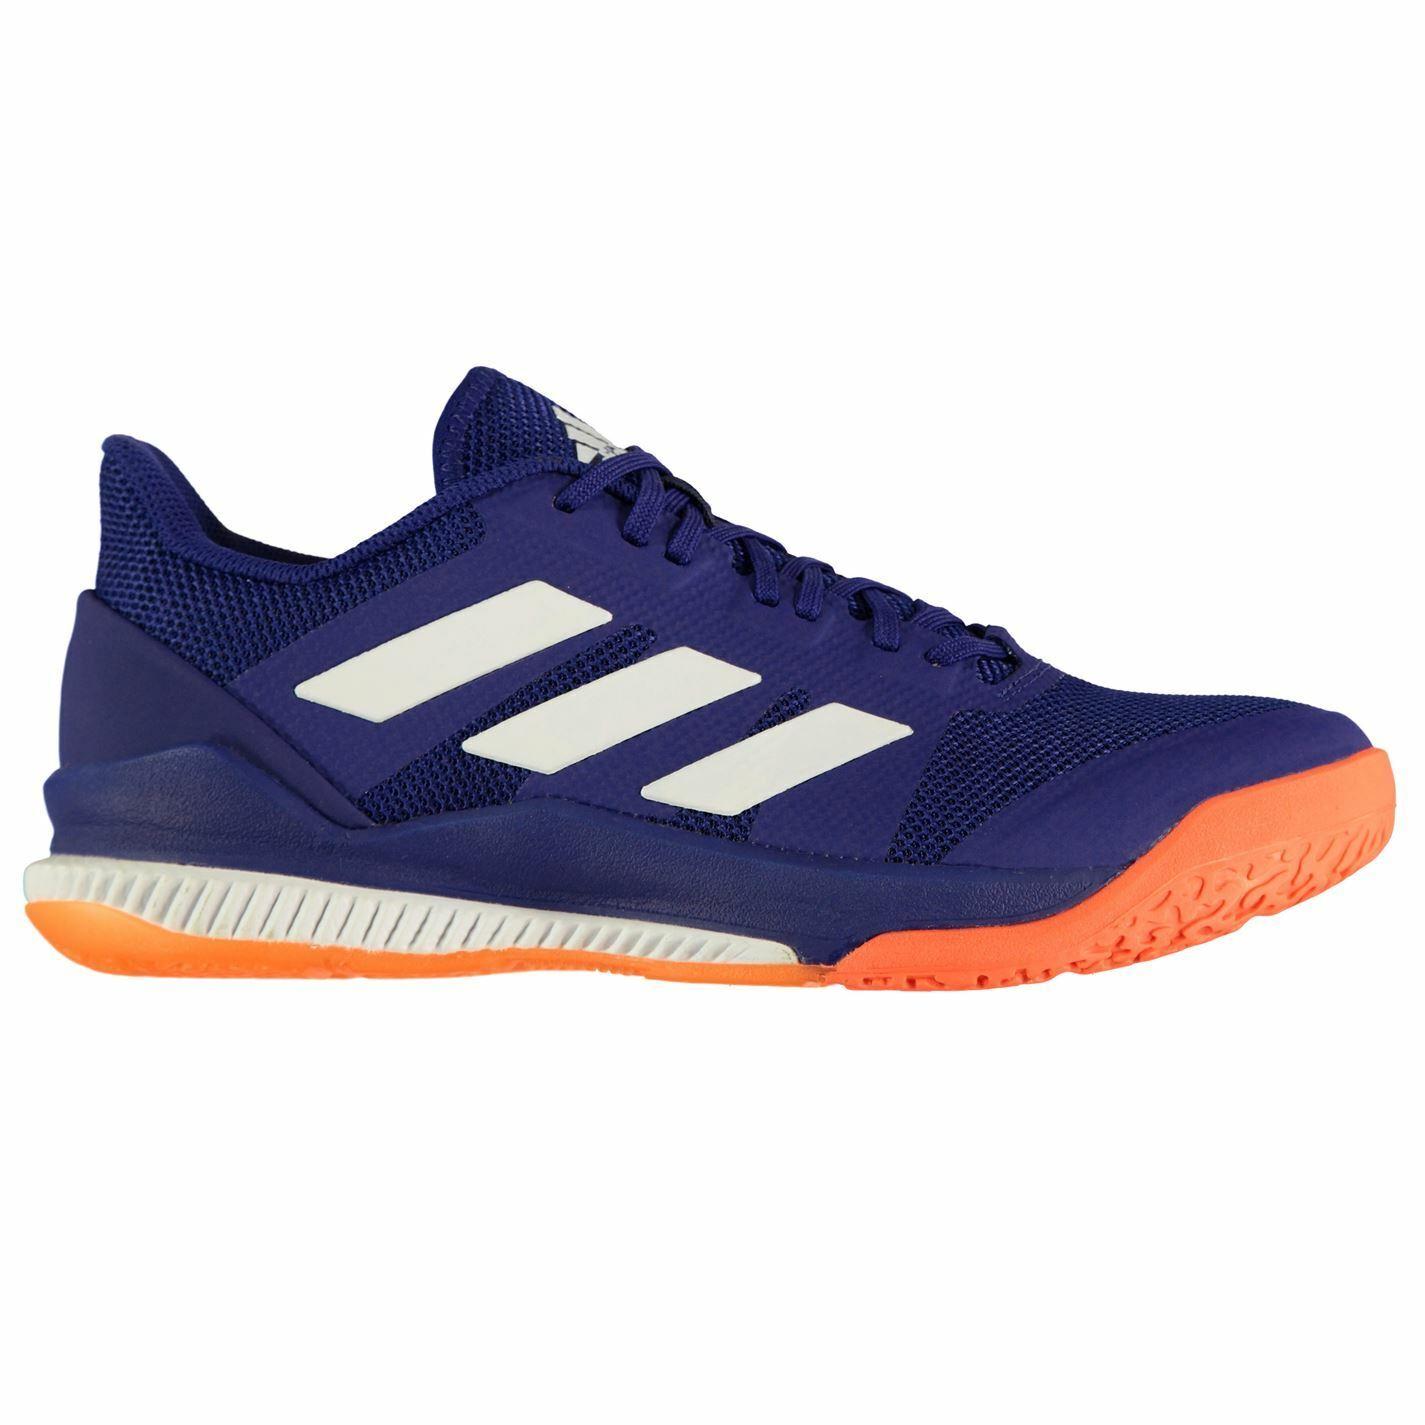 Power trainers crossfit schuhe Training daSie Adidas Lifting